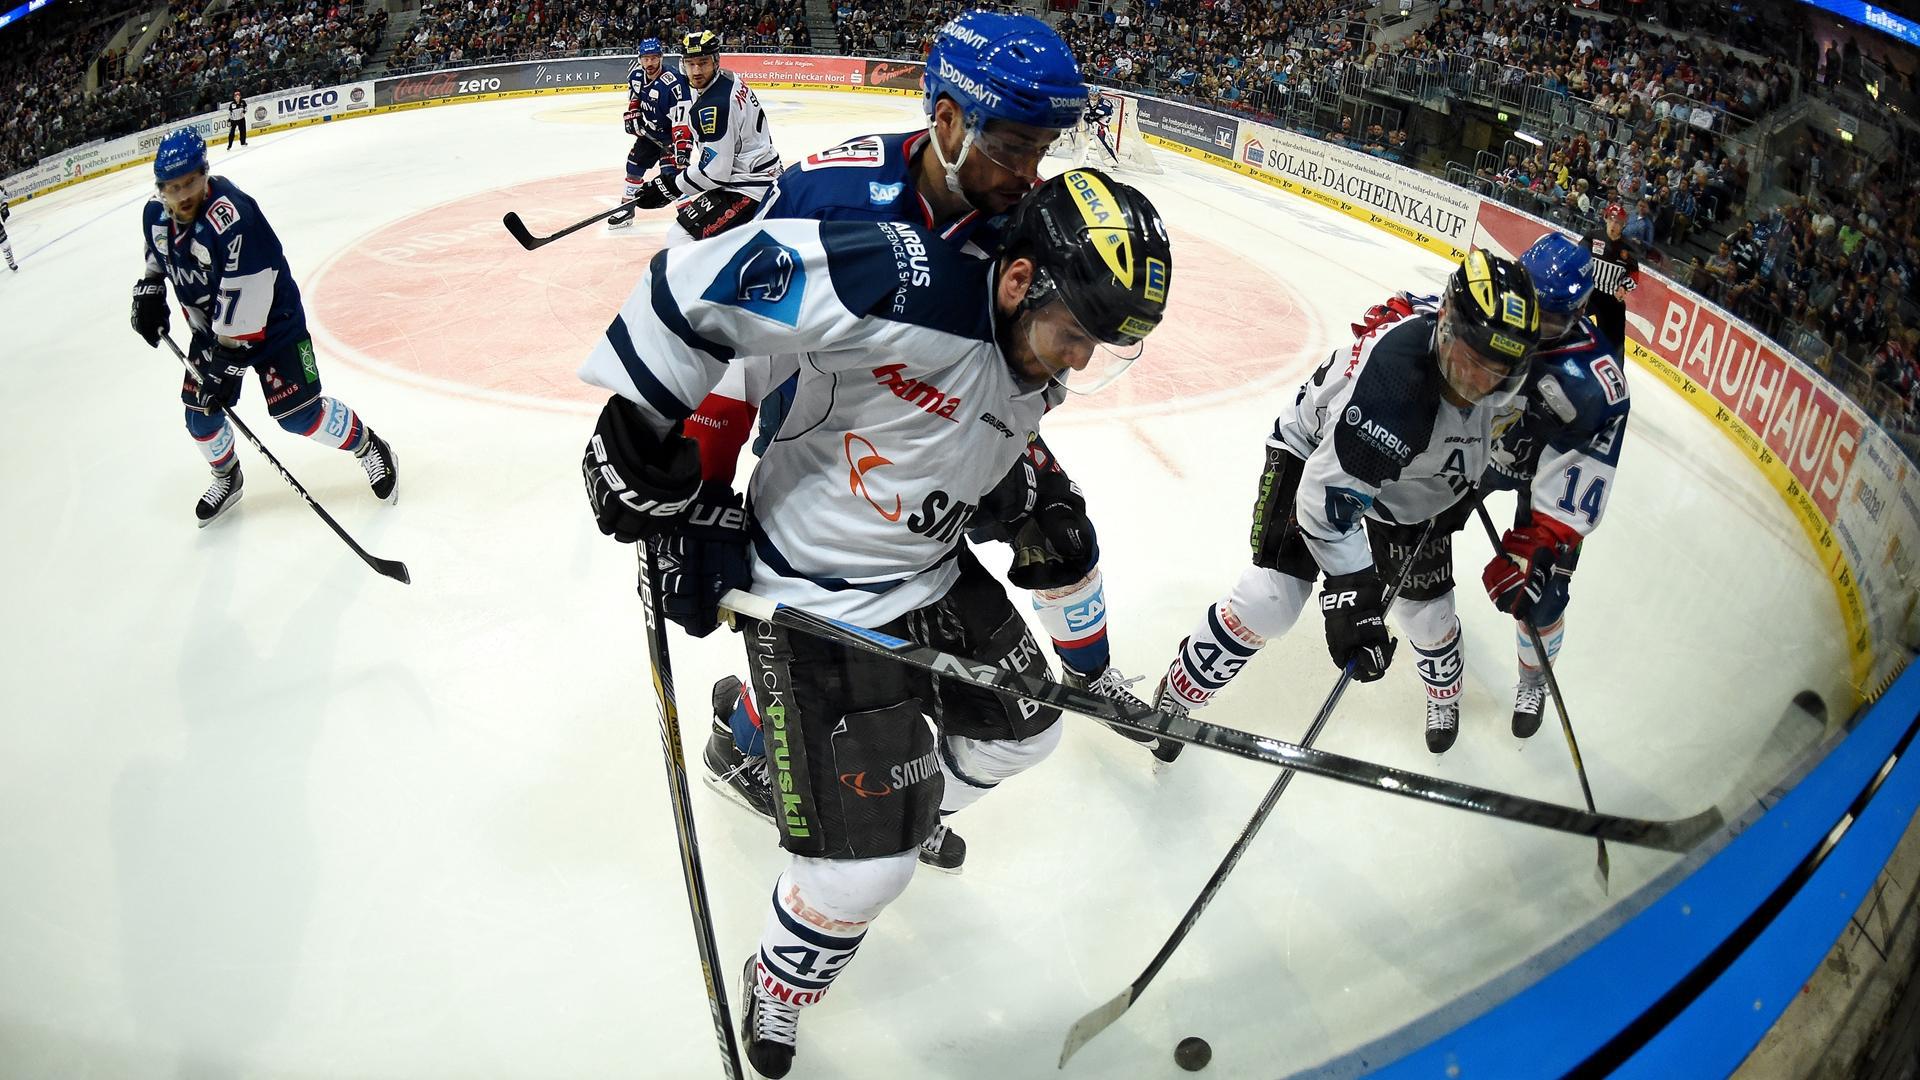 Sportwetten eishockey del